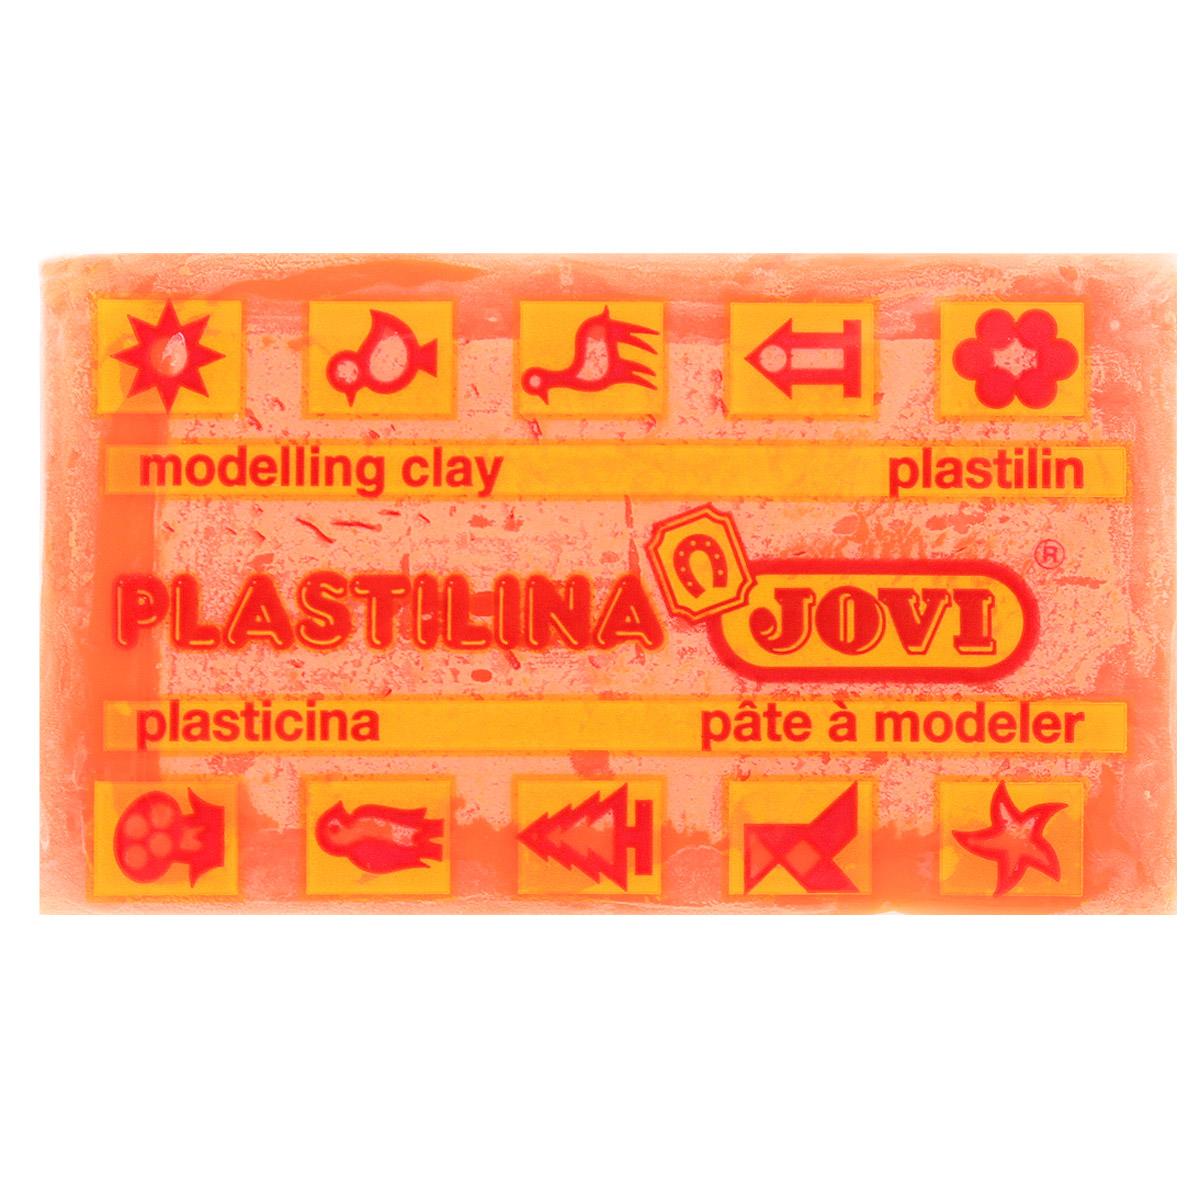 Jovi Пластилин флюоресцентный, цвет: ярко-оранжевый, 50 г schleich набор для конных преград schleich